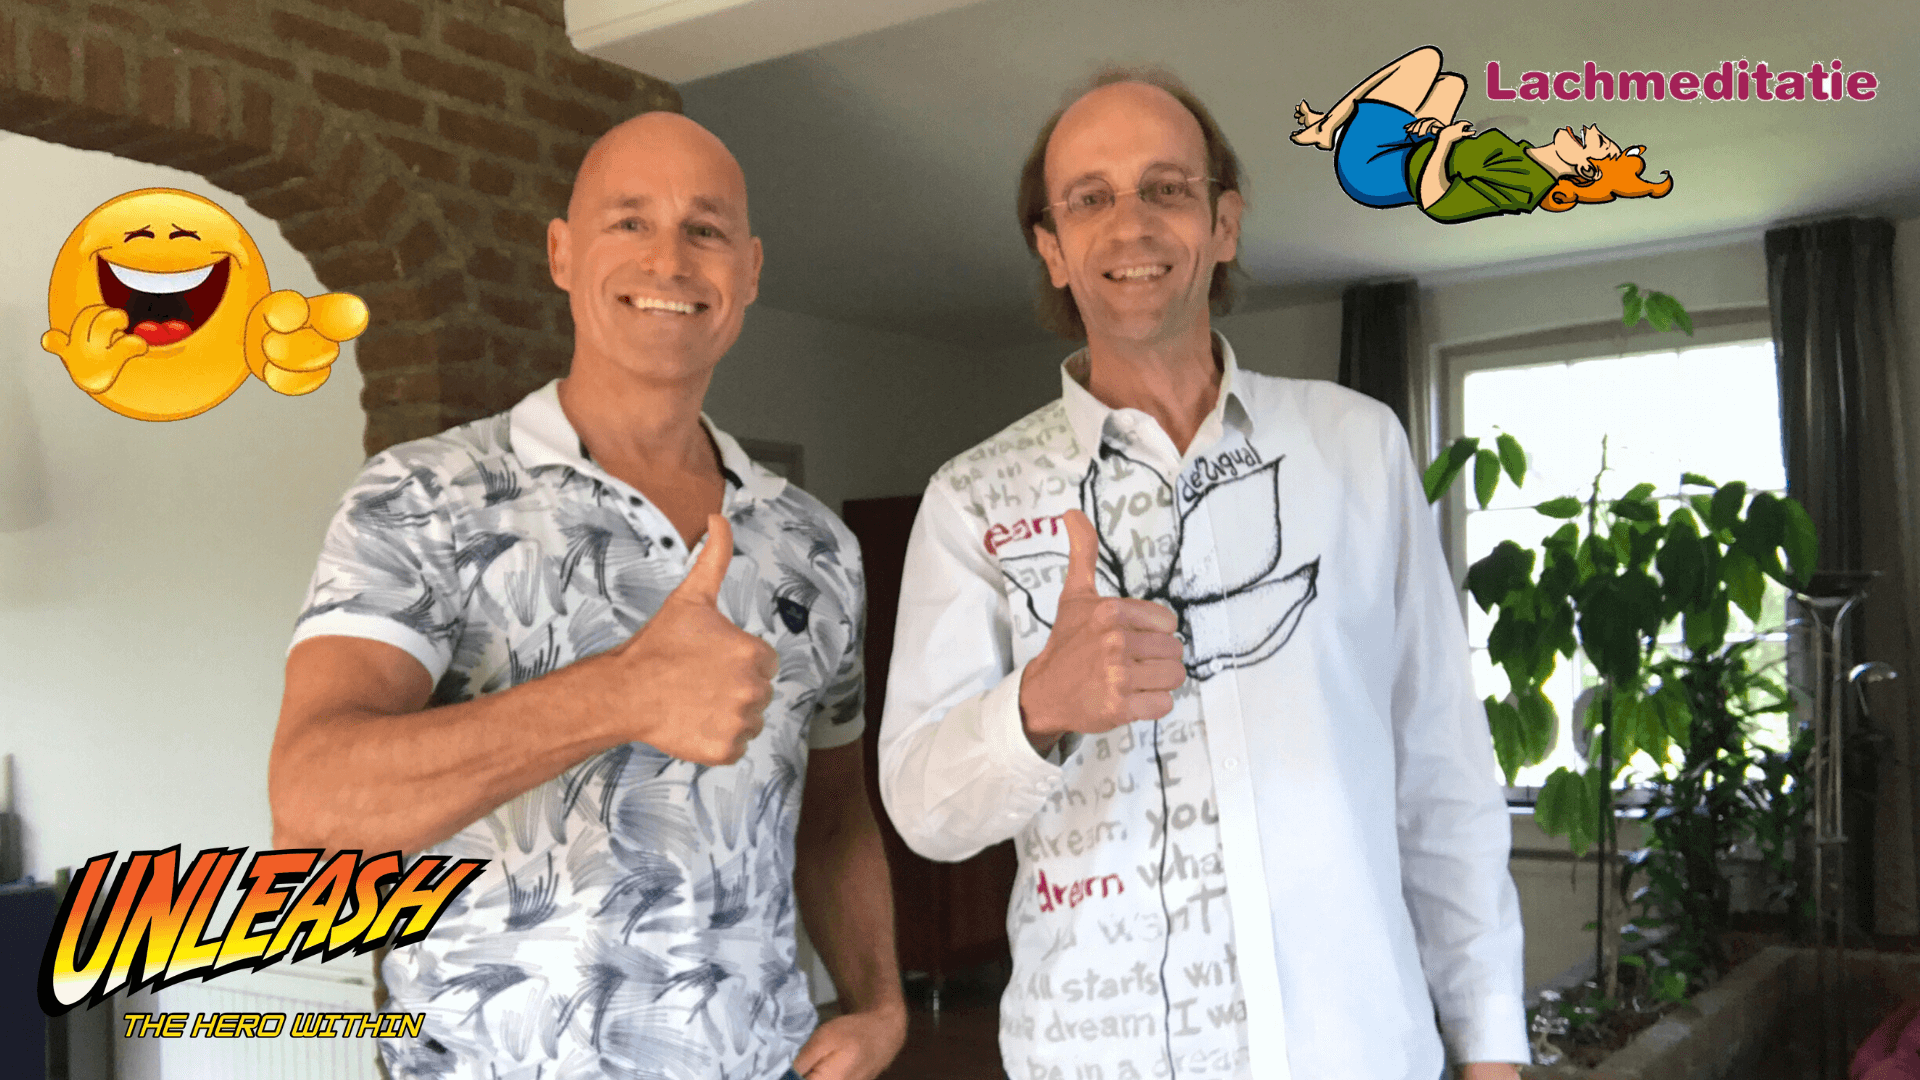 Podcast Marcel Lahaije met Jan Gommans